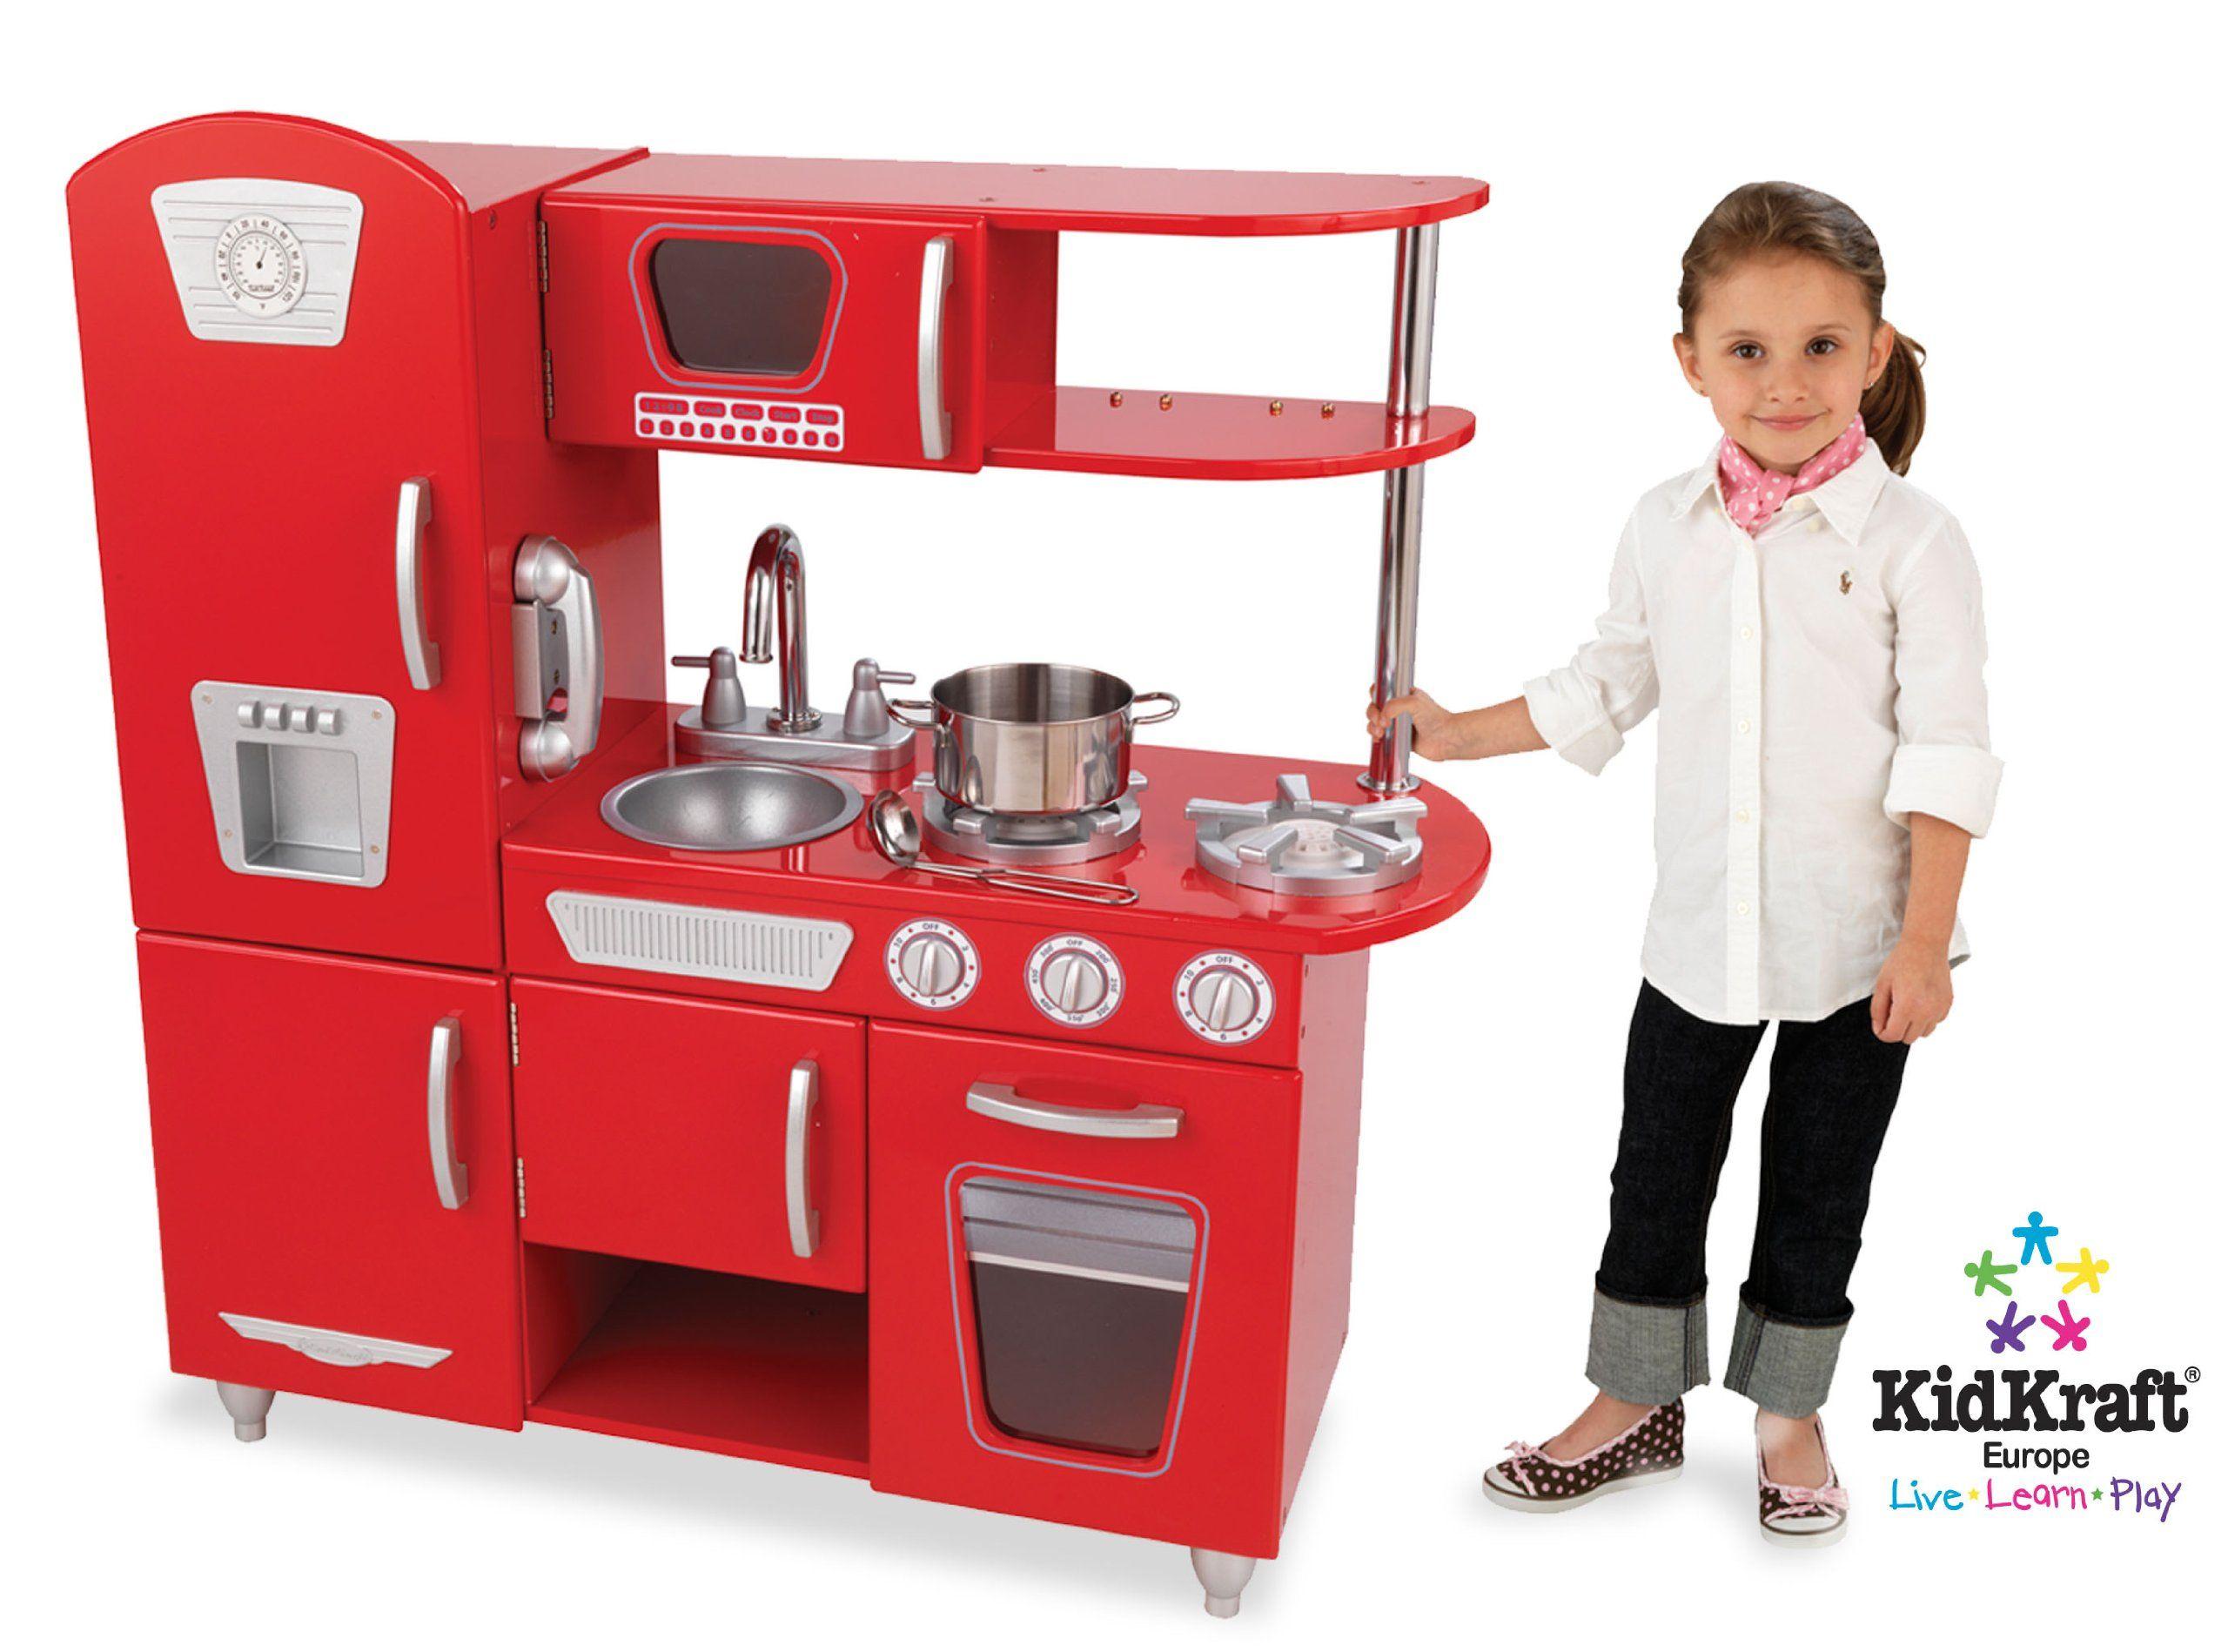 Kidkraft large pastel kitchen  Amazon KidKraft Red Vintage Kitchen Toys u Games  Gift ideas